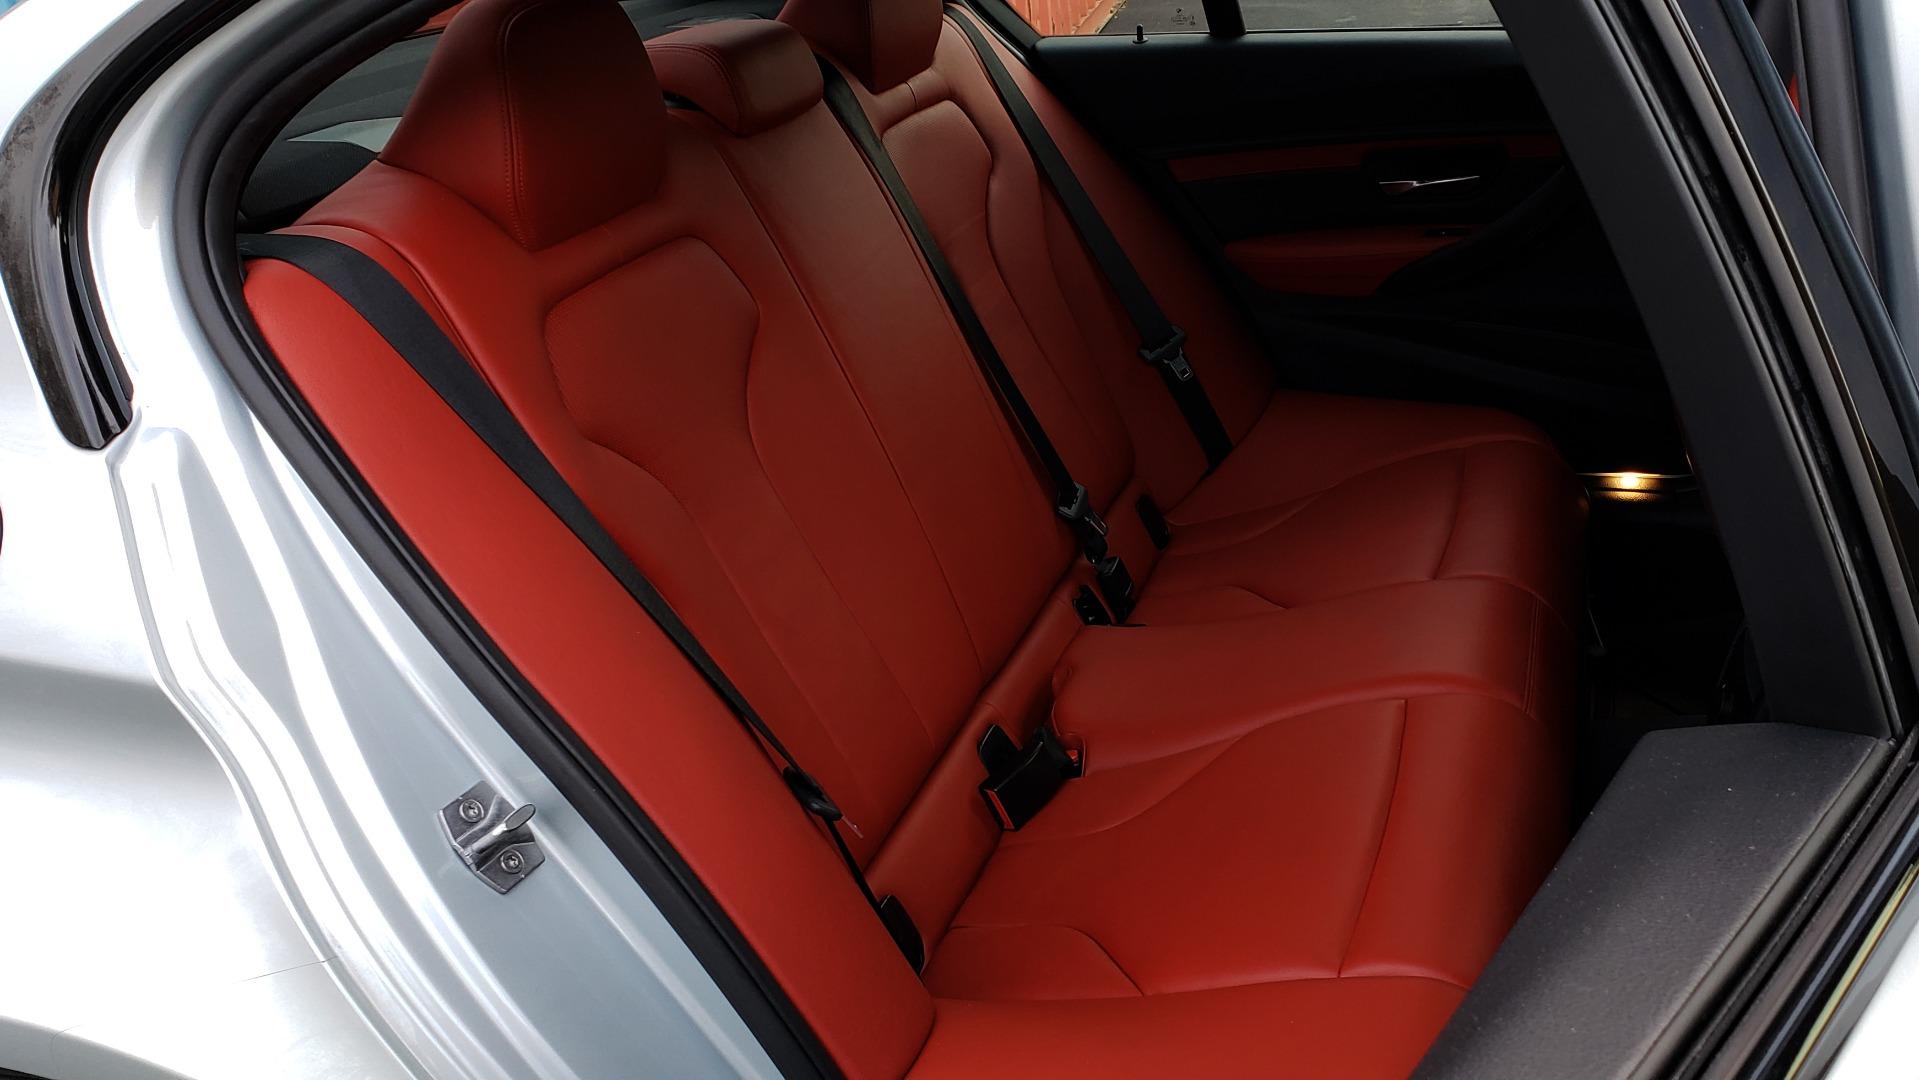 Used 2015 BMW M3 EXECUTIVE PKG / NAV / CAMERA / HUD / CARBON FIBER ROOF for sale Sold at Formula Imports in Charlotte NC 28227 84